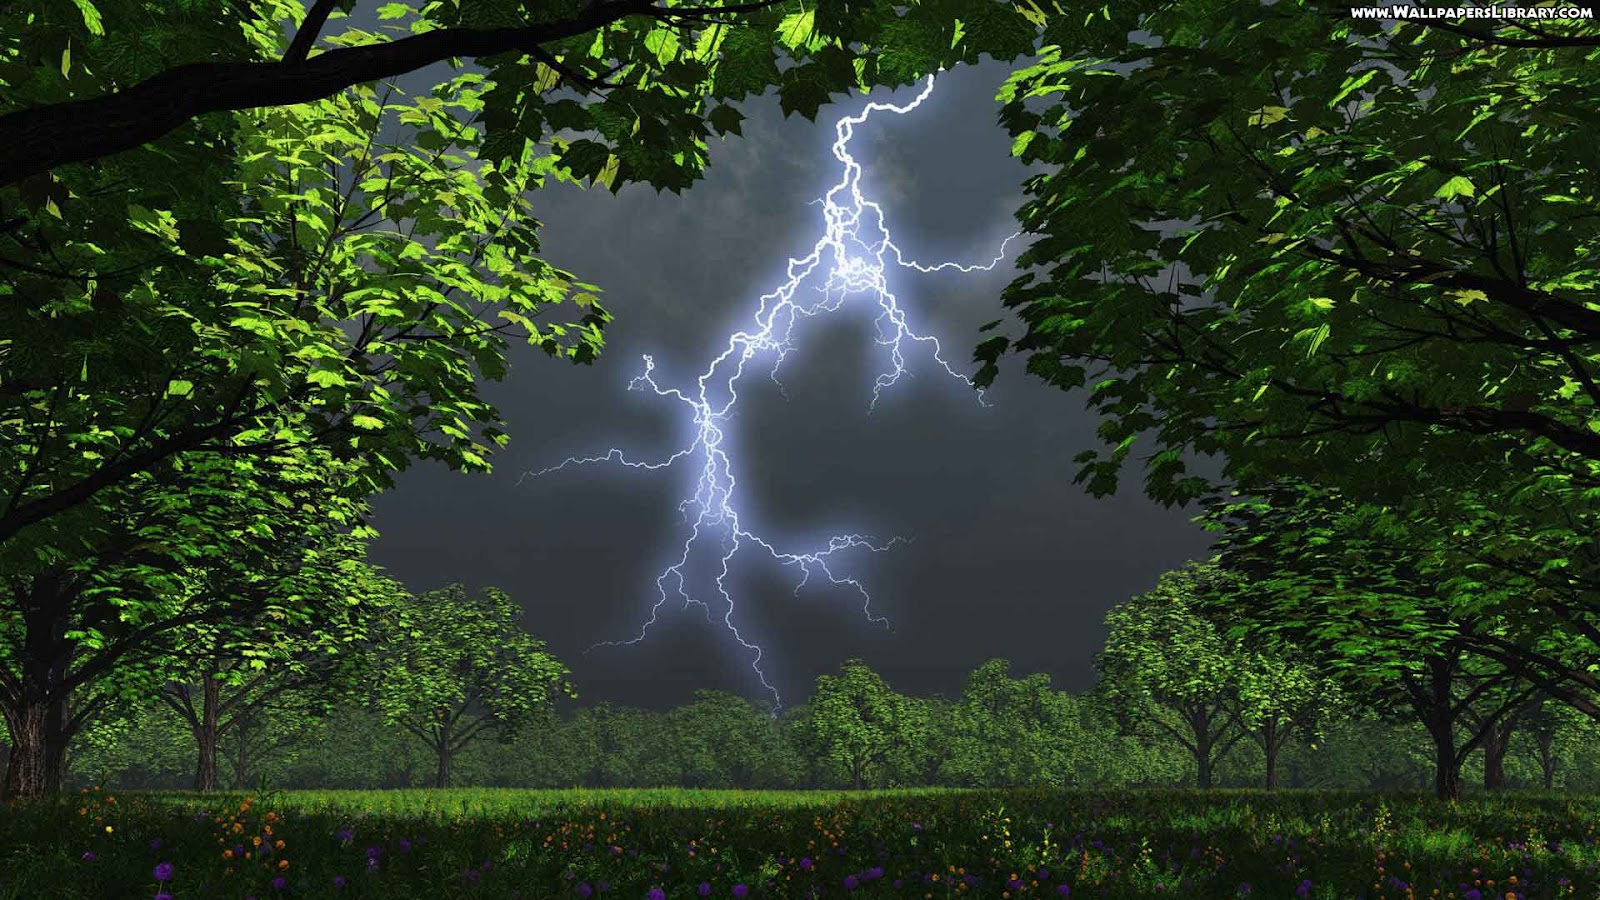 Wallpapers   HD Desktop Wallpapers Online Lightning Strikes 1600x900